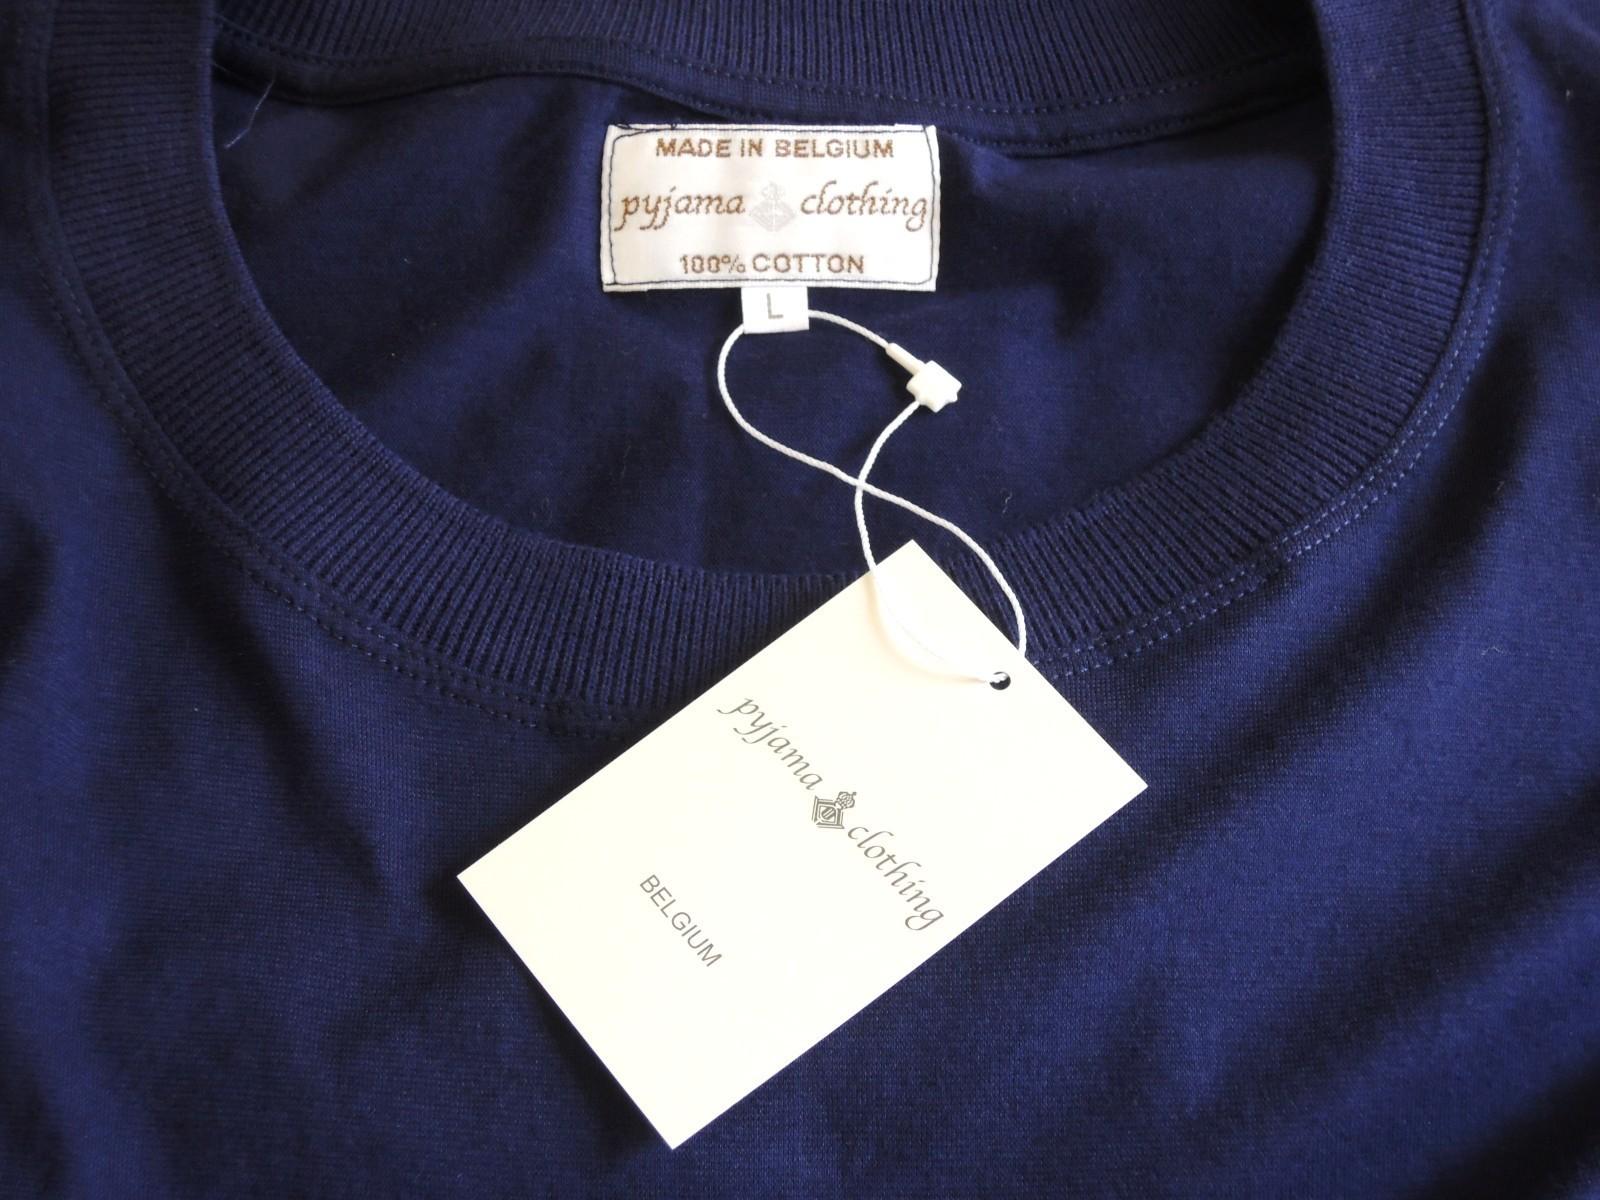 pyjamaclothingdolmanpockettshirts02.JPG